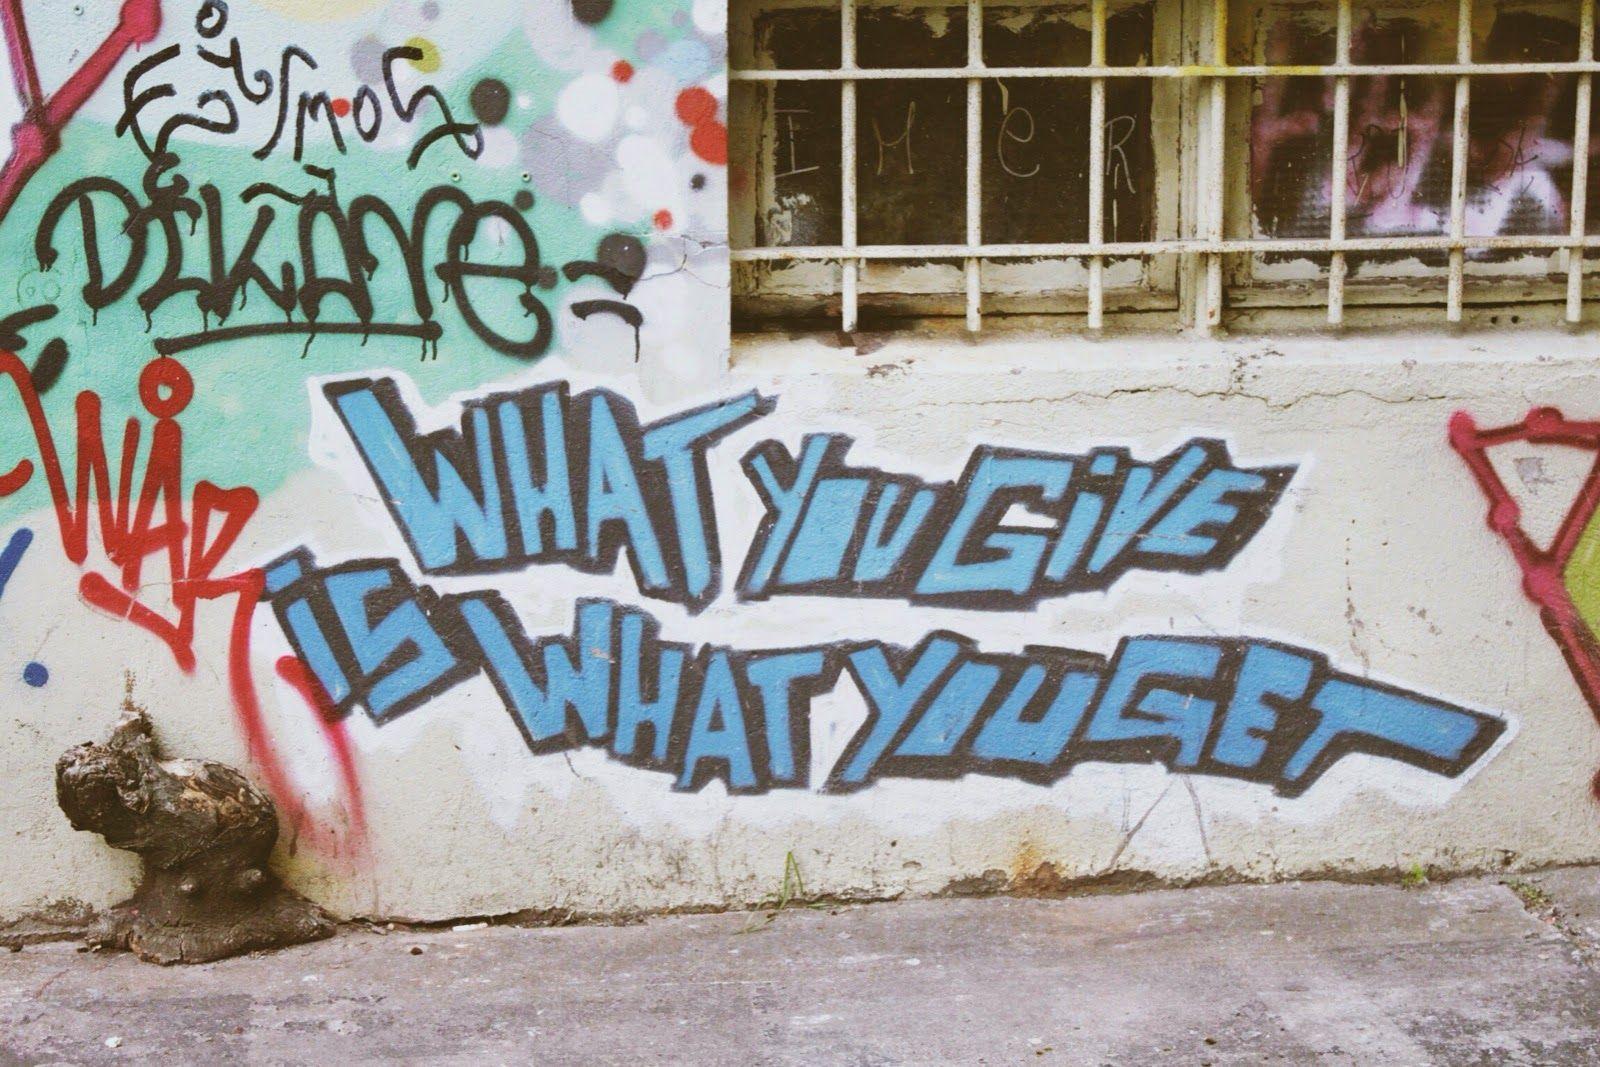 It's Brogues itsbrogues.co.uk #travel #berlin #graffiti